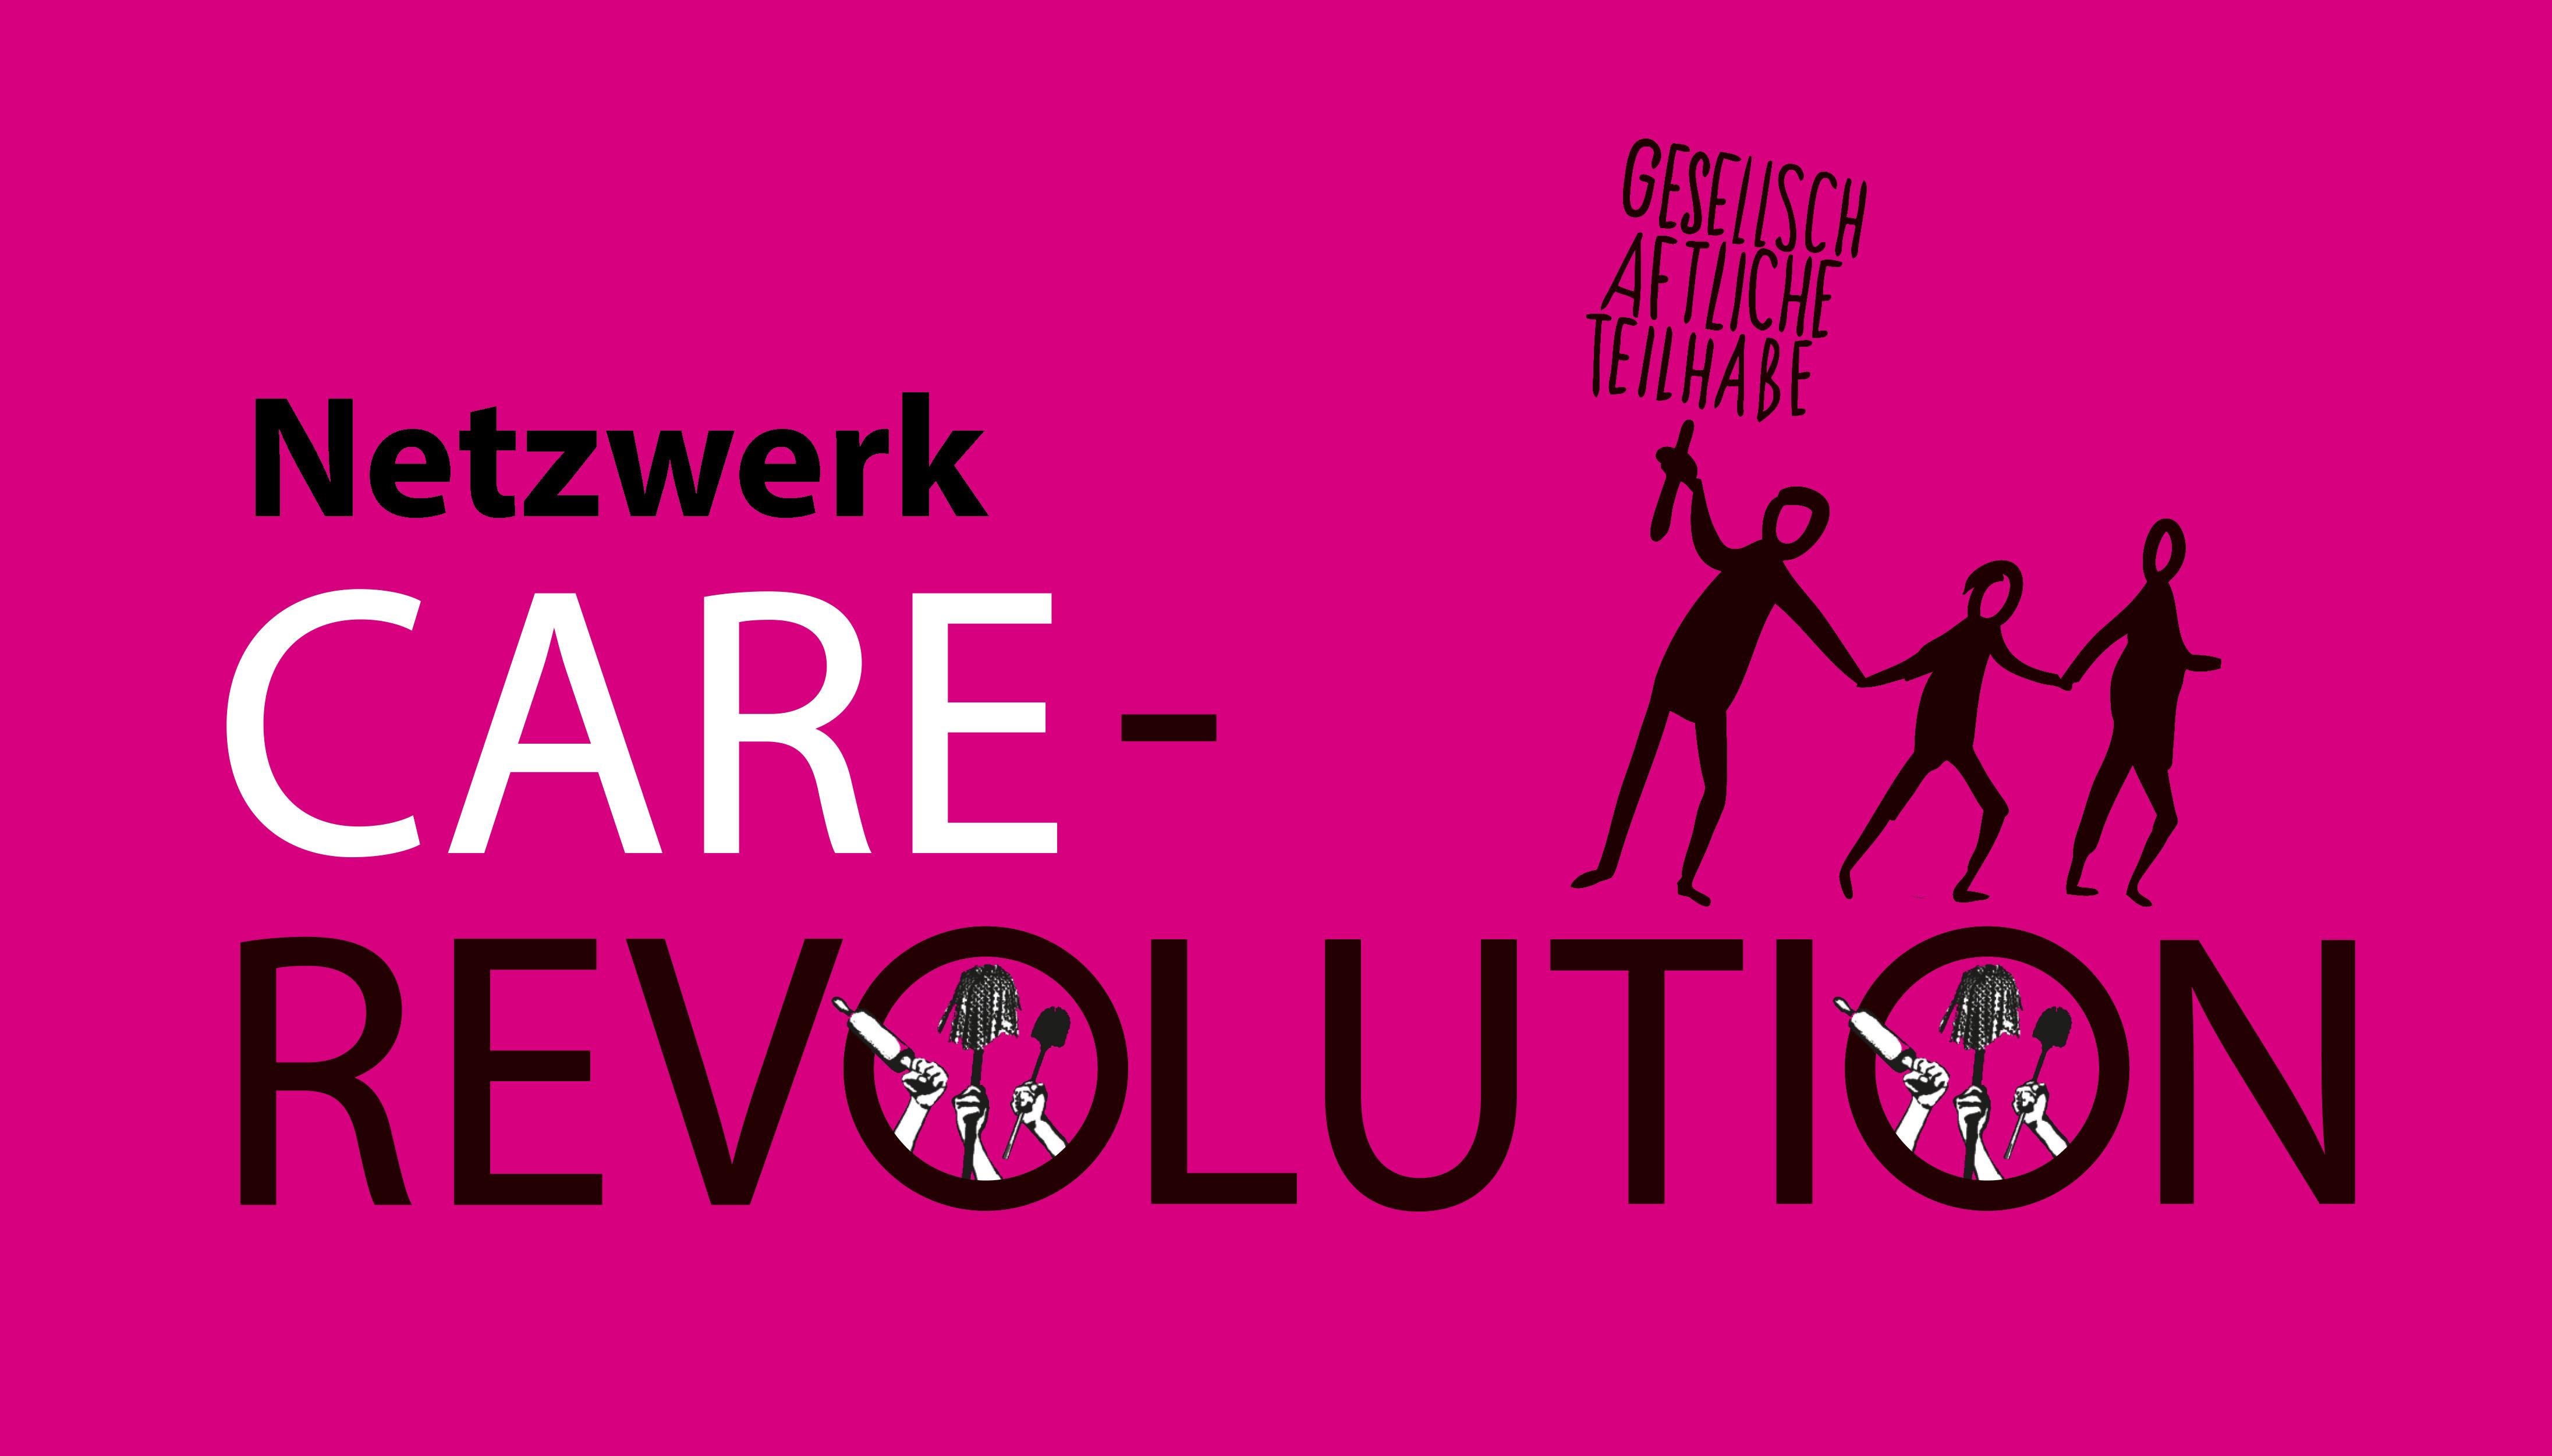 http://care-revolution.org/wp-content/uploads/2015/01/Logo-f%C3%BCr-Webseiten.jpg